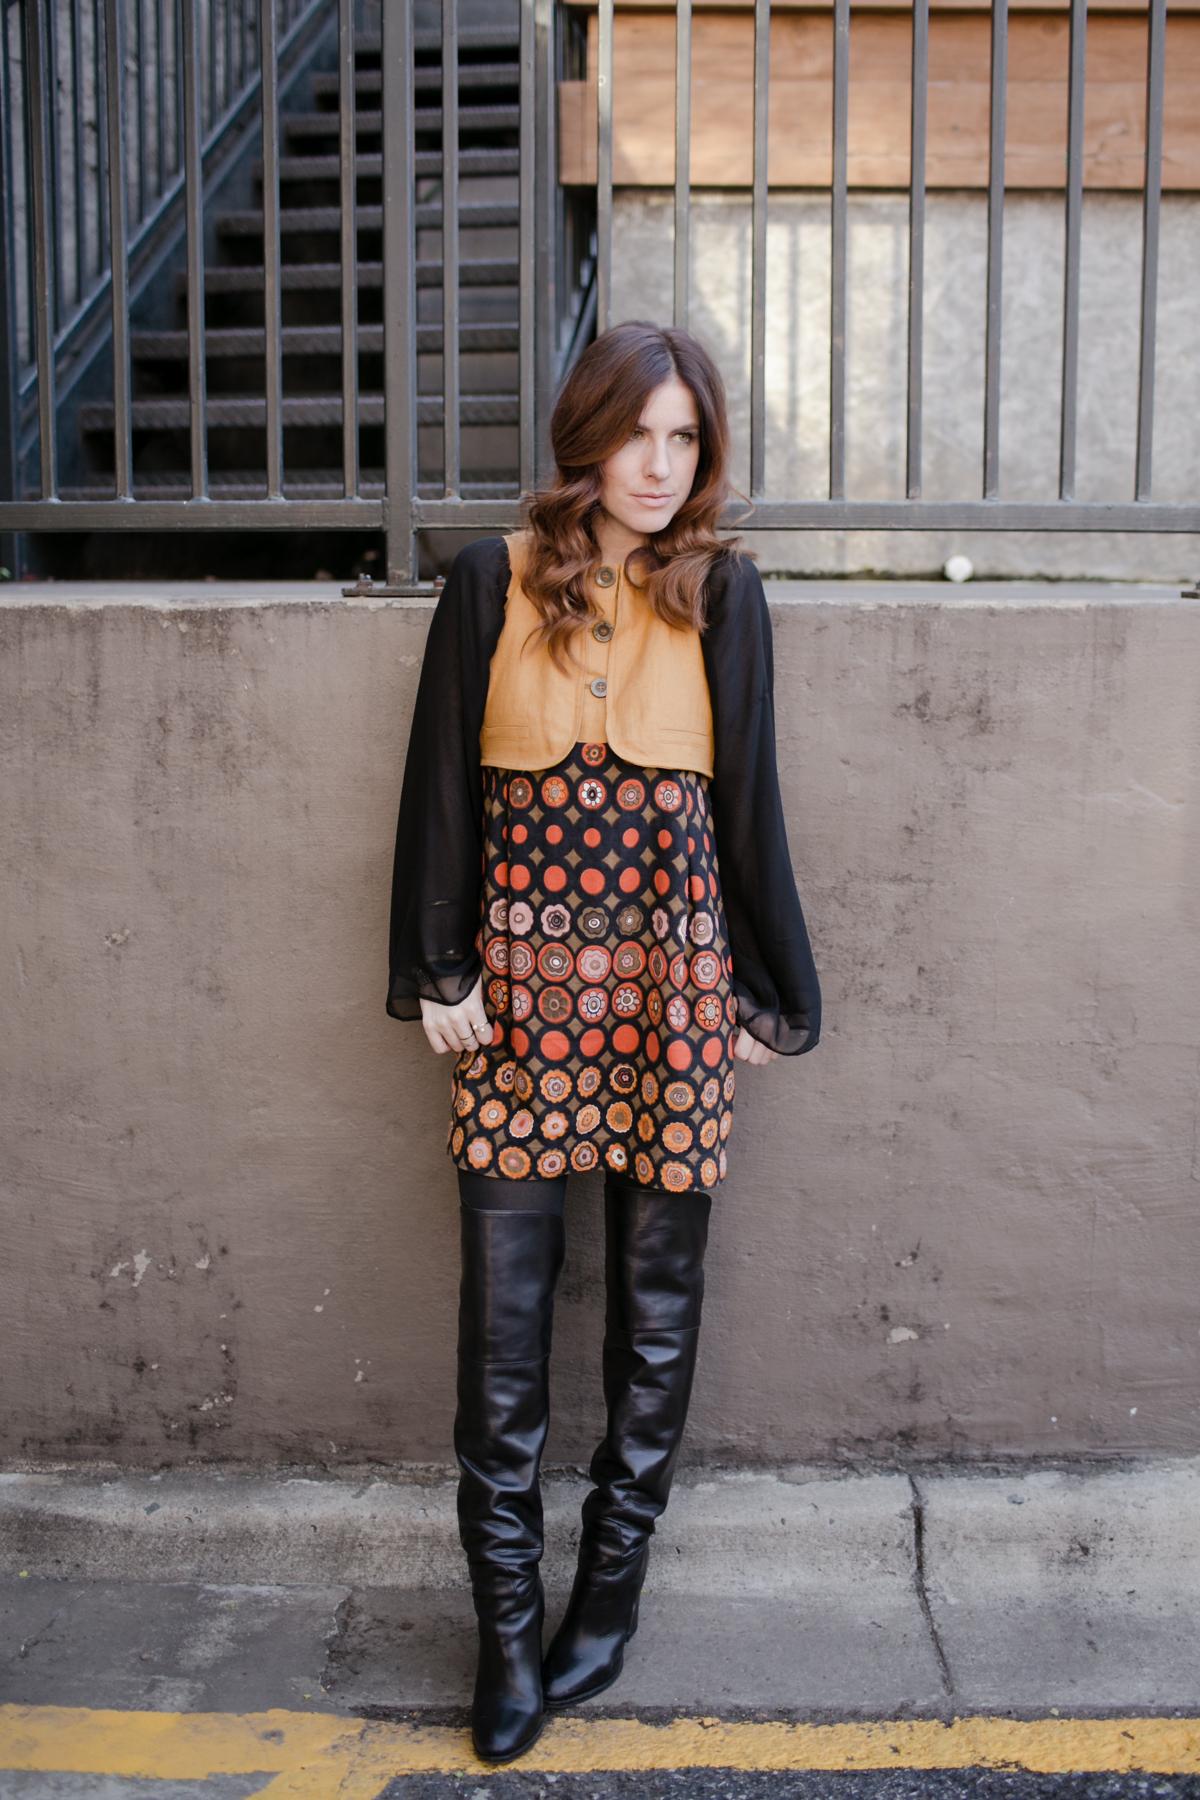 Eldridge Edit_Anna_E_Cottrell_Tulip_Louise_Fashion_Blogger_Chloe_Dress_seventies_Ralph_Lauren_Over_The_Knee_Boots_Black_3.jpg